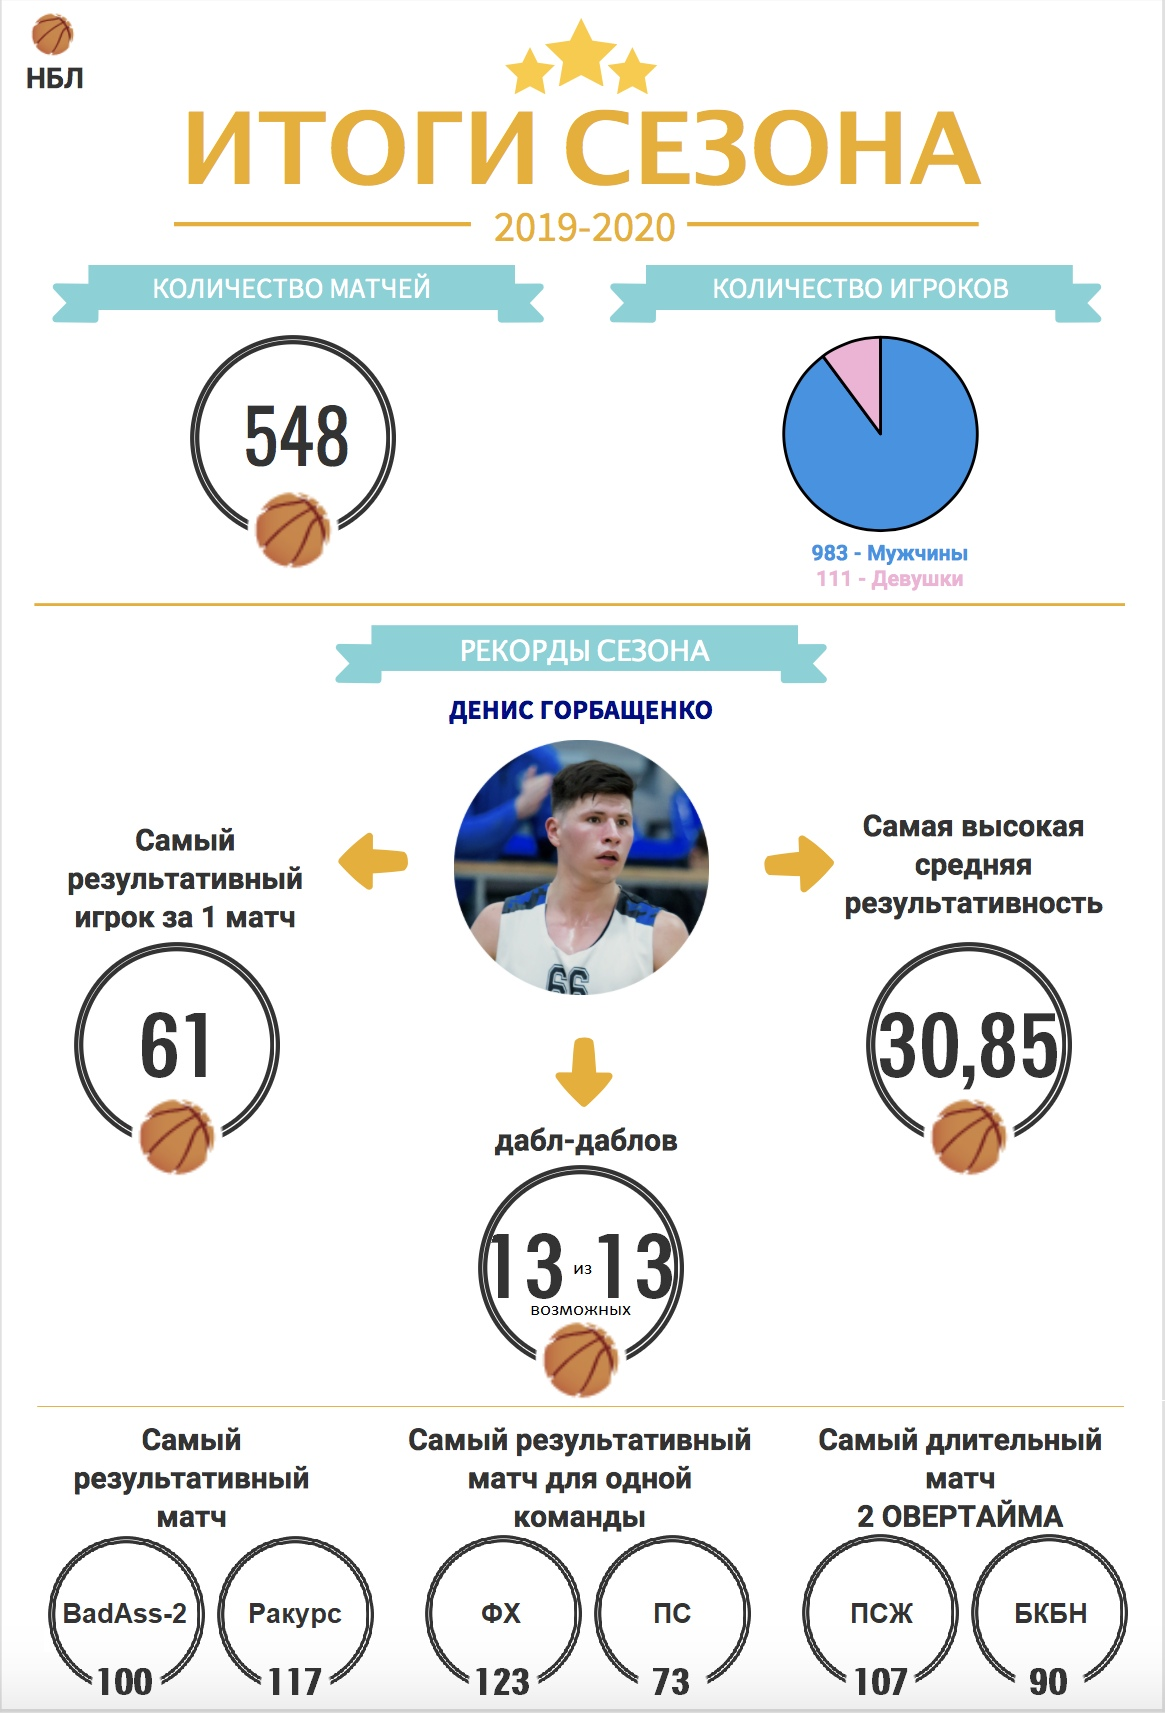 Итоги сезона 2019-2020